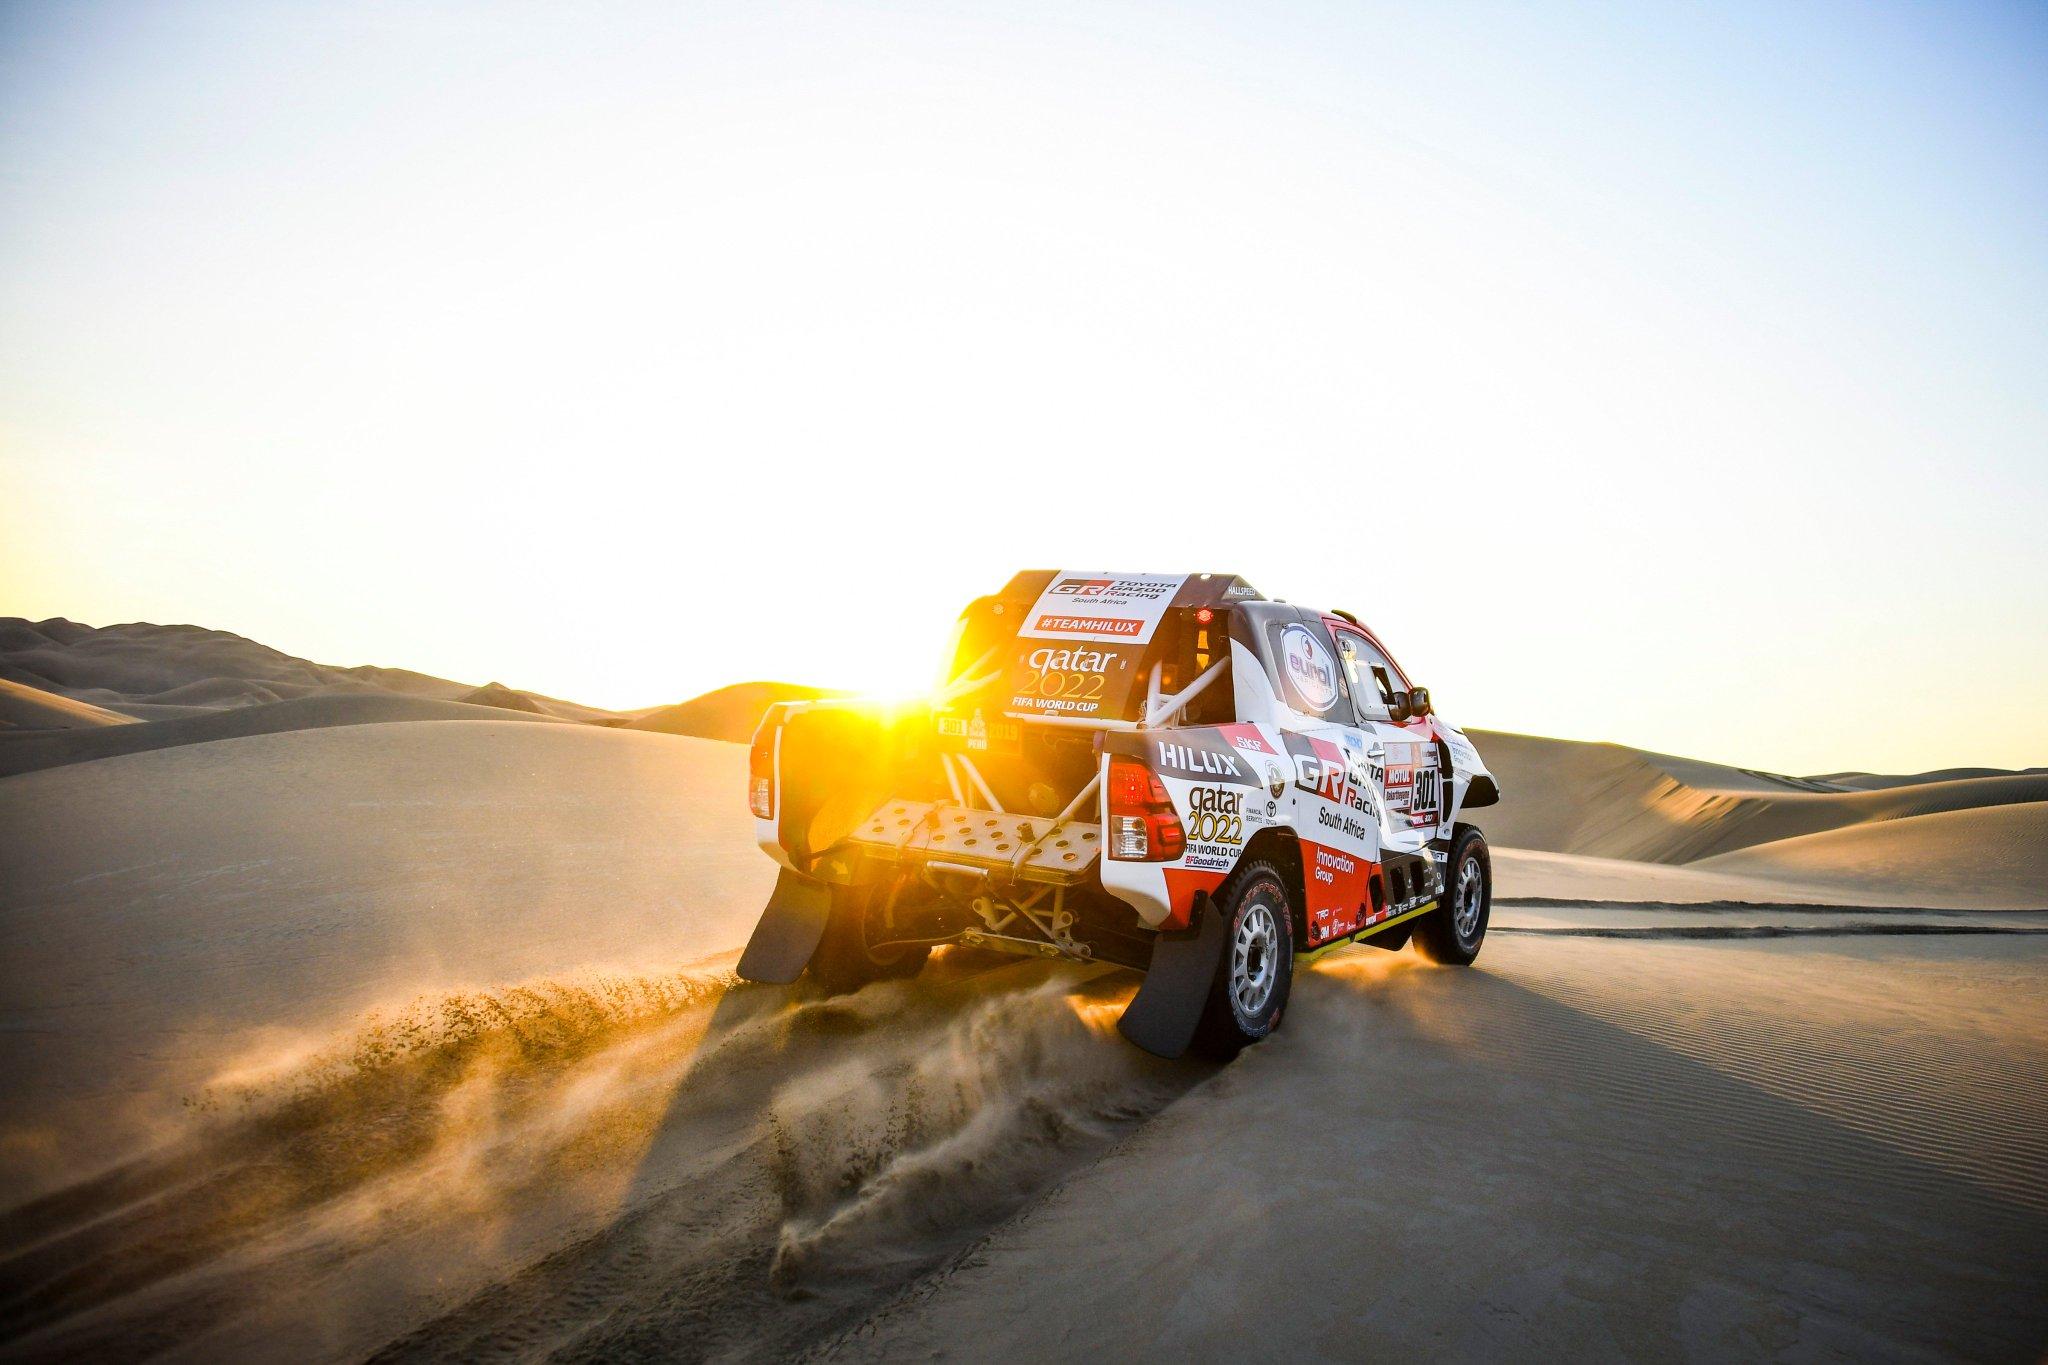 Dakar 2019 - Página 4 Dwk3c3JX0Ag-klt